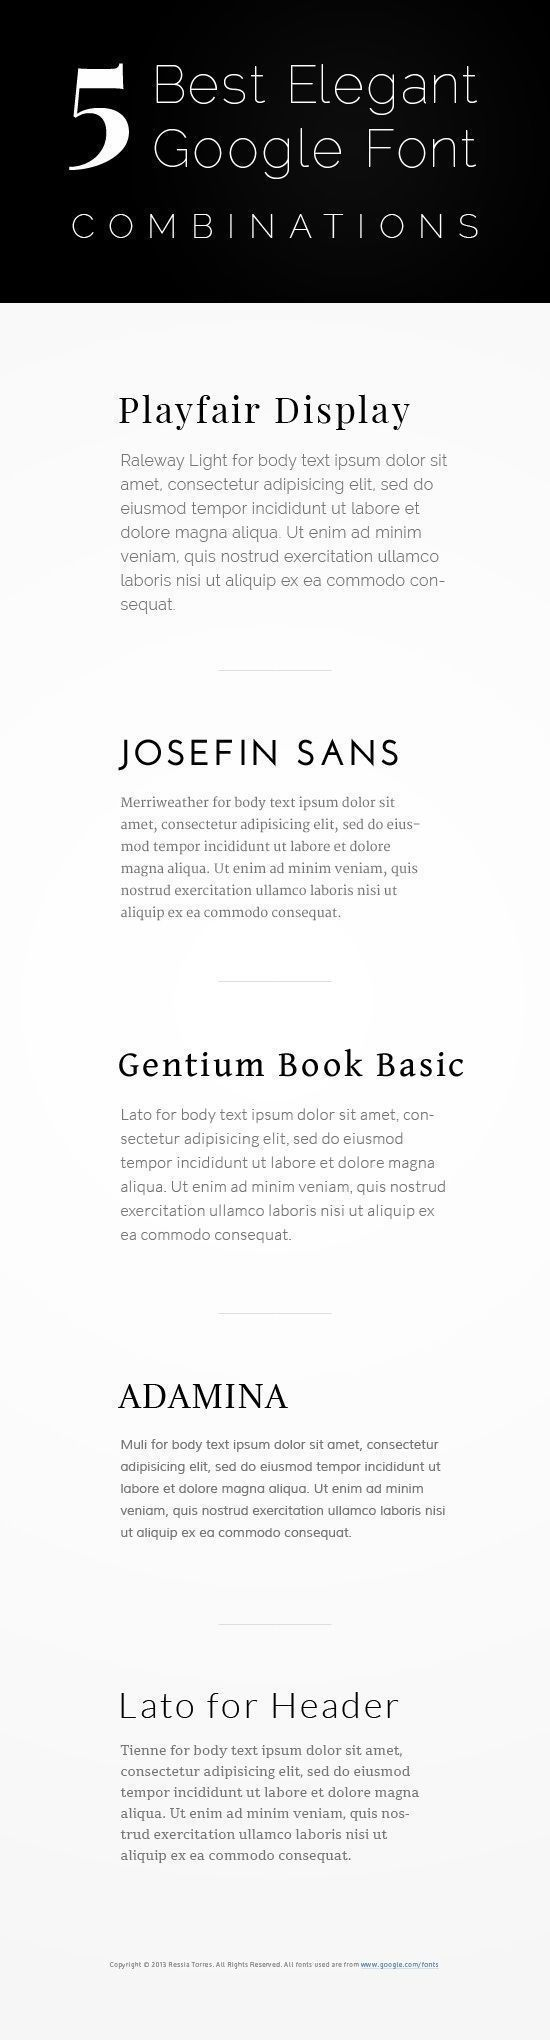 Branding Design Ideas Branding Yourself Branding Inspoiration Branding Board Branding Ide Typography Design Font Combinations Graphic Design Typography